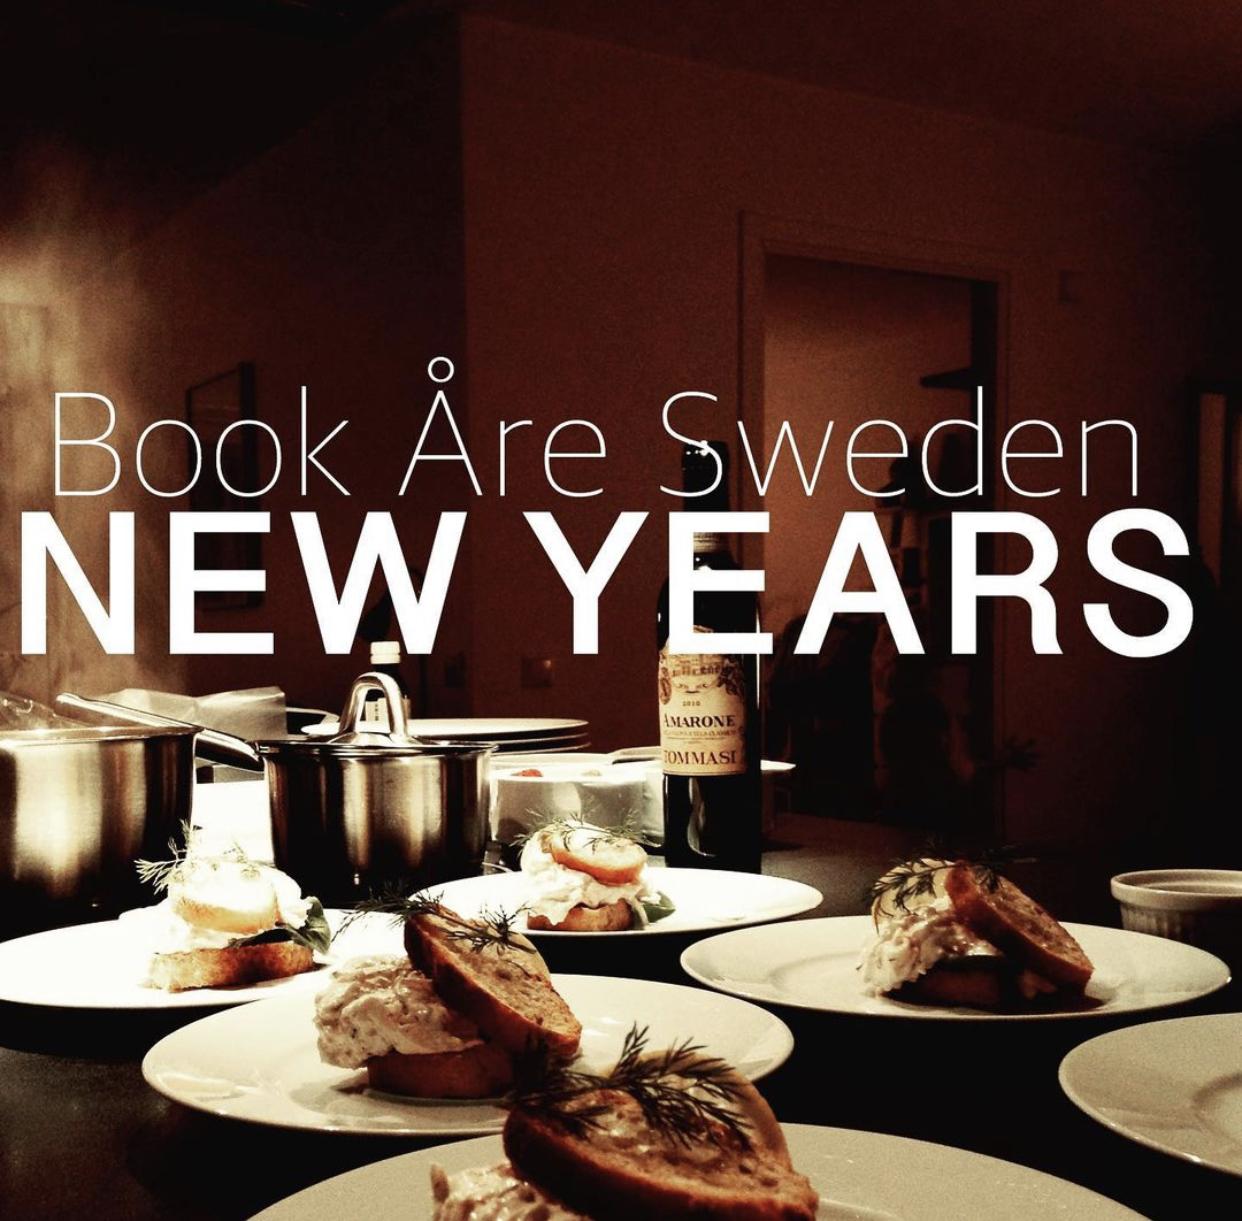 Book_Åre_Sweden_New_Years